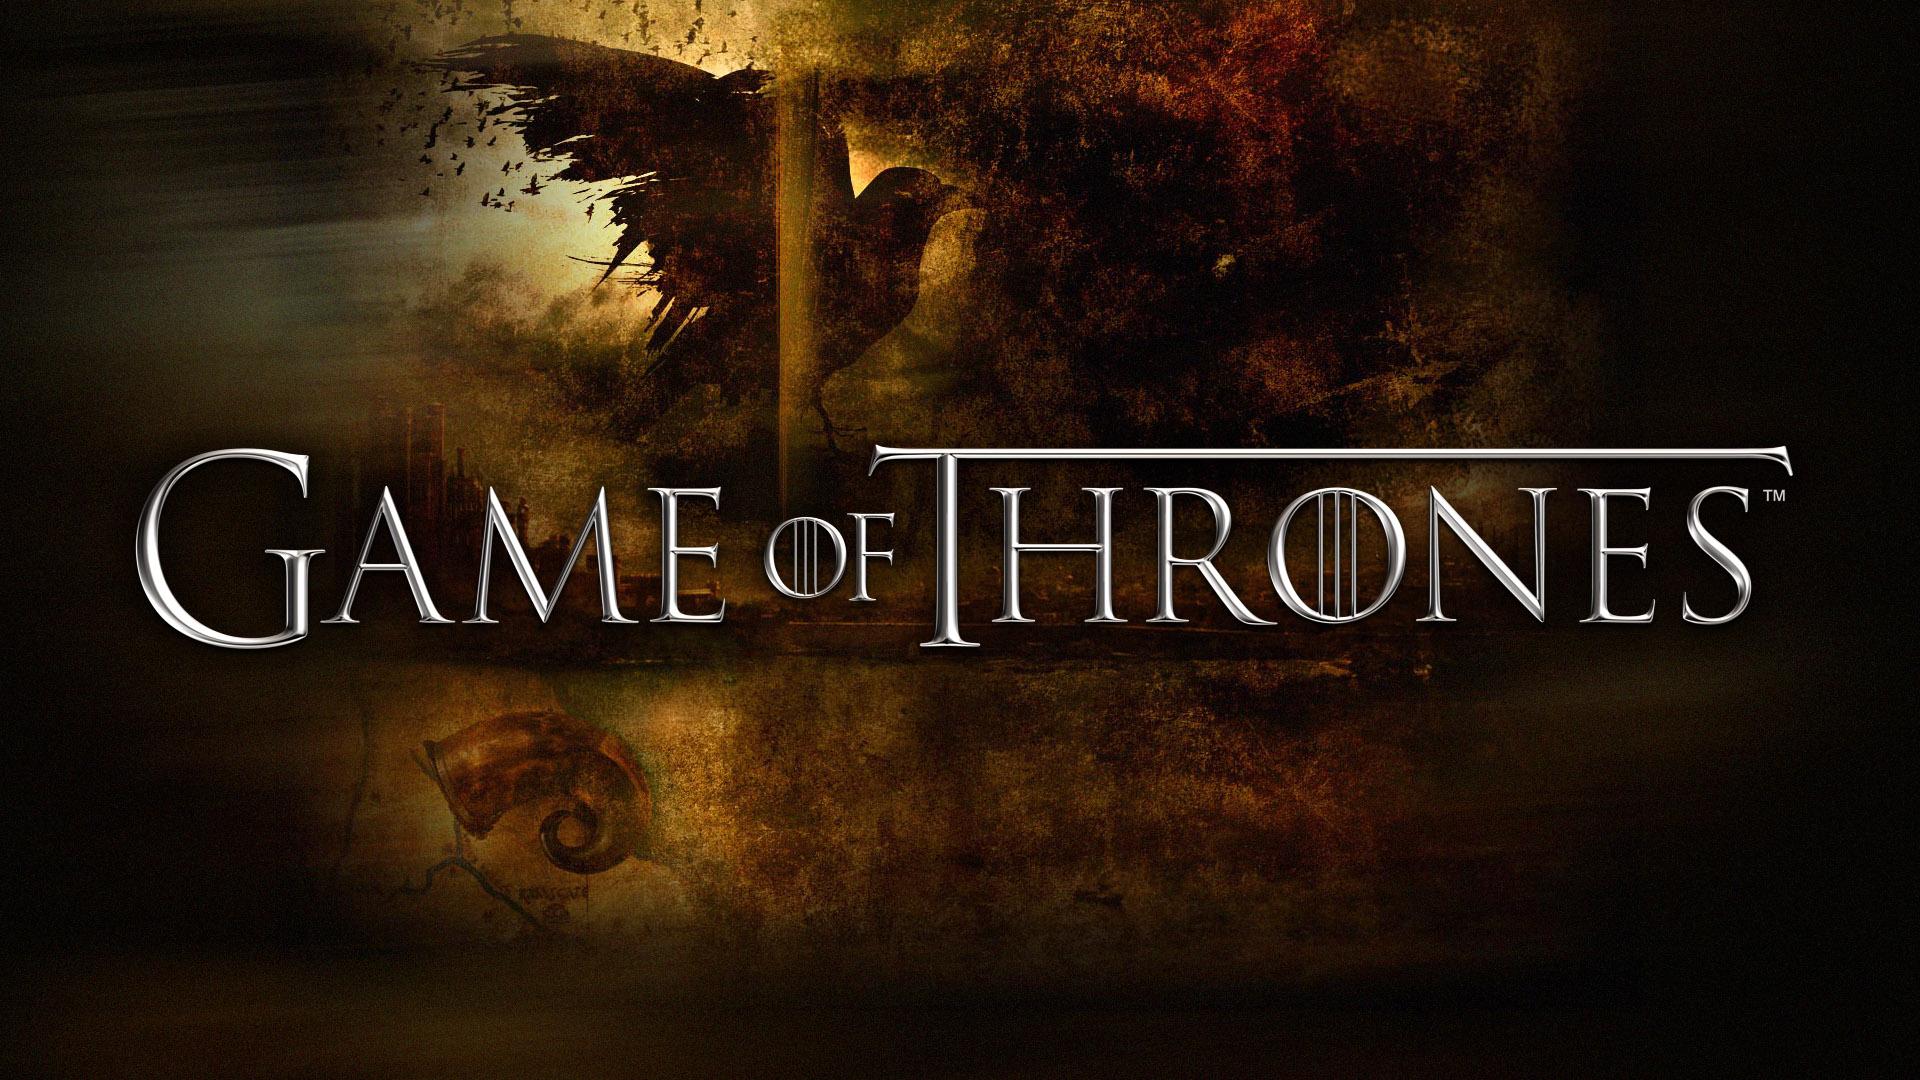 (Bildquelle: http://www.wewantmedia.de/wp/wp-content/uploads/2013/05/game-of-thrones.jpg)